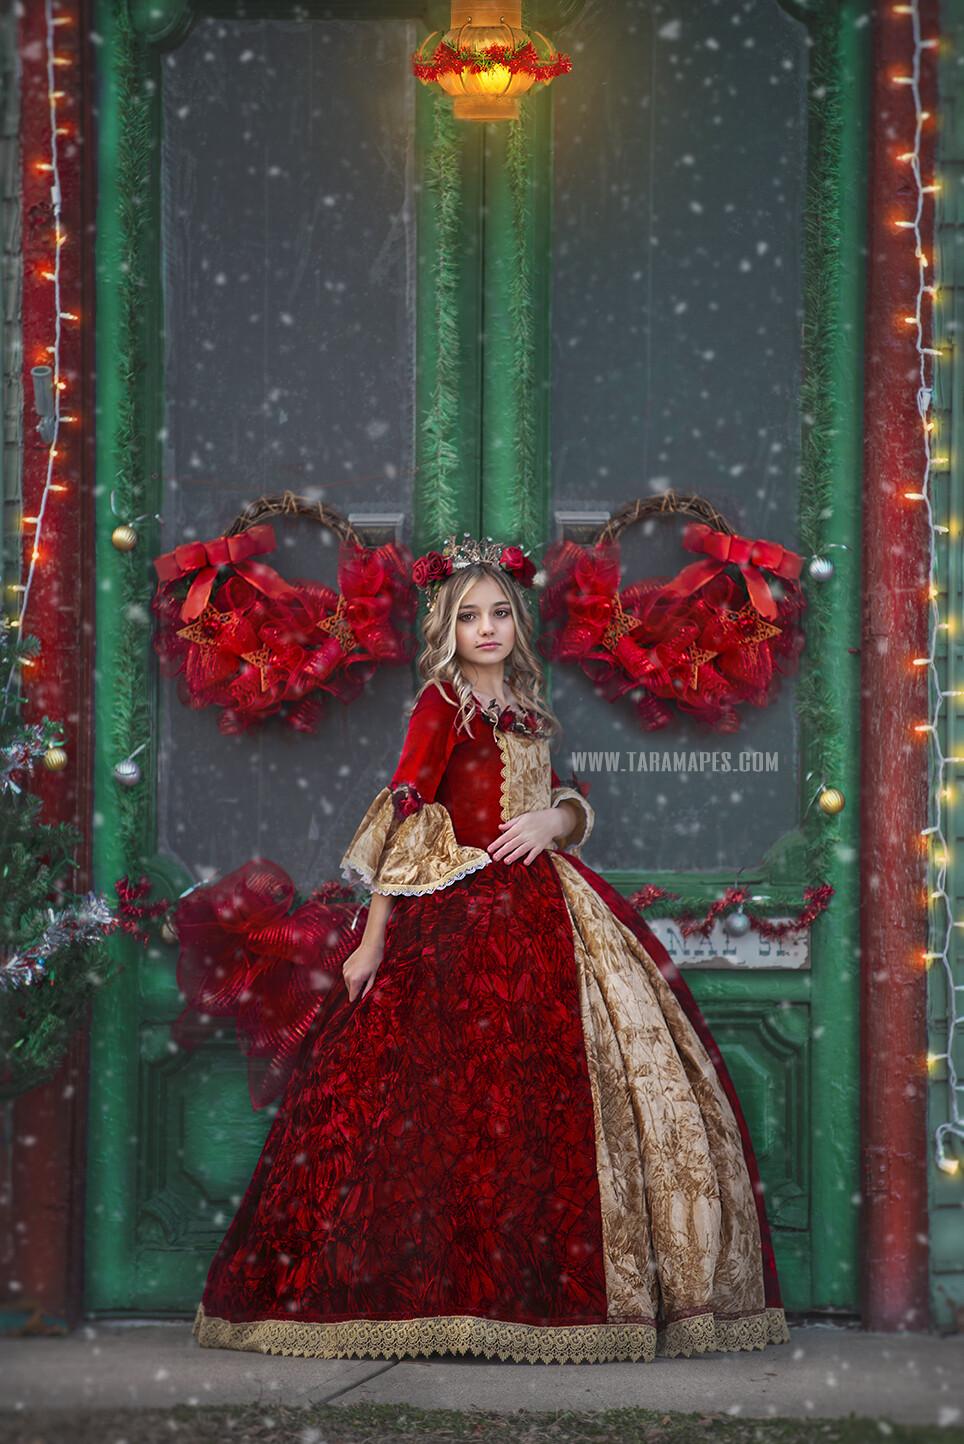 Christmas Door in Christmas Town- Holiday Christmas Street - Christmas Town Winter Wonderland - Scene for Portraits Digital Background